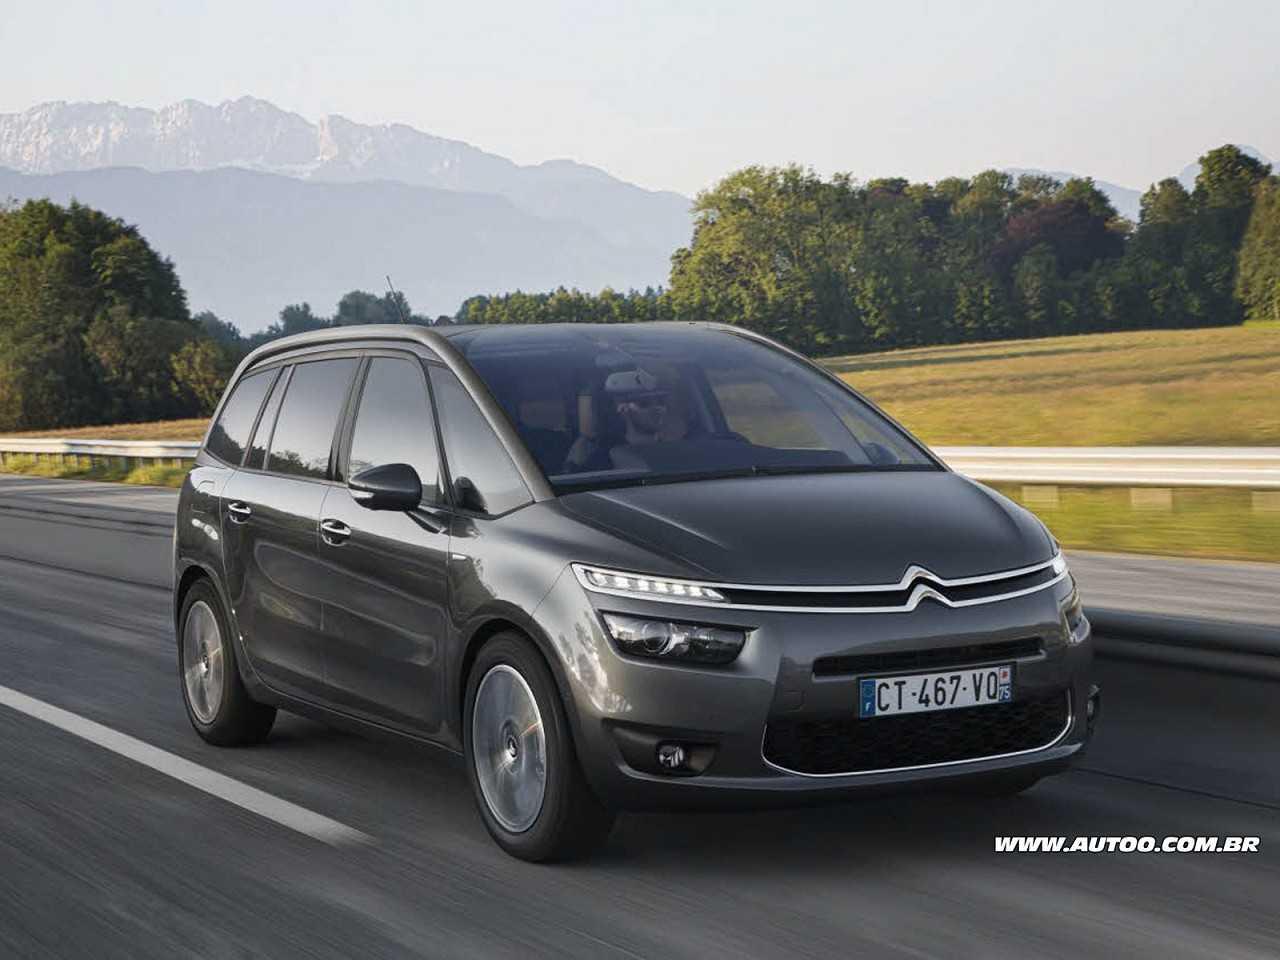 CitroënC4 Picasso 2016 - ângulo frontal